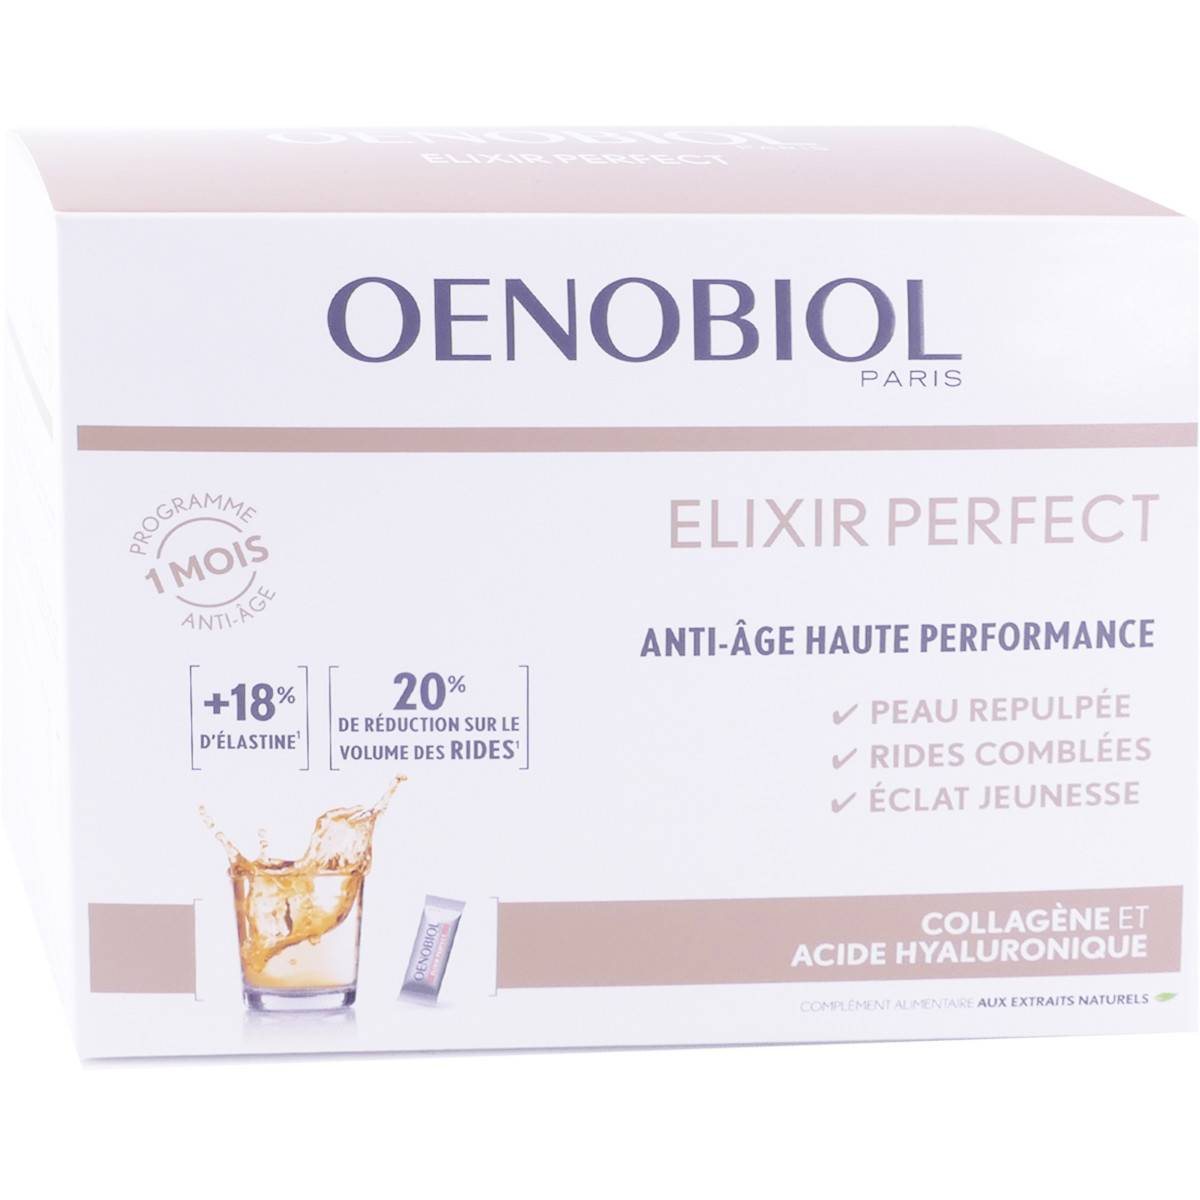 Oenobiol elixir perfect anti-age 30 sticks